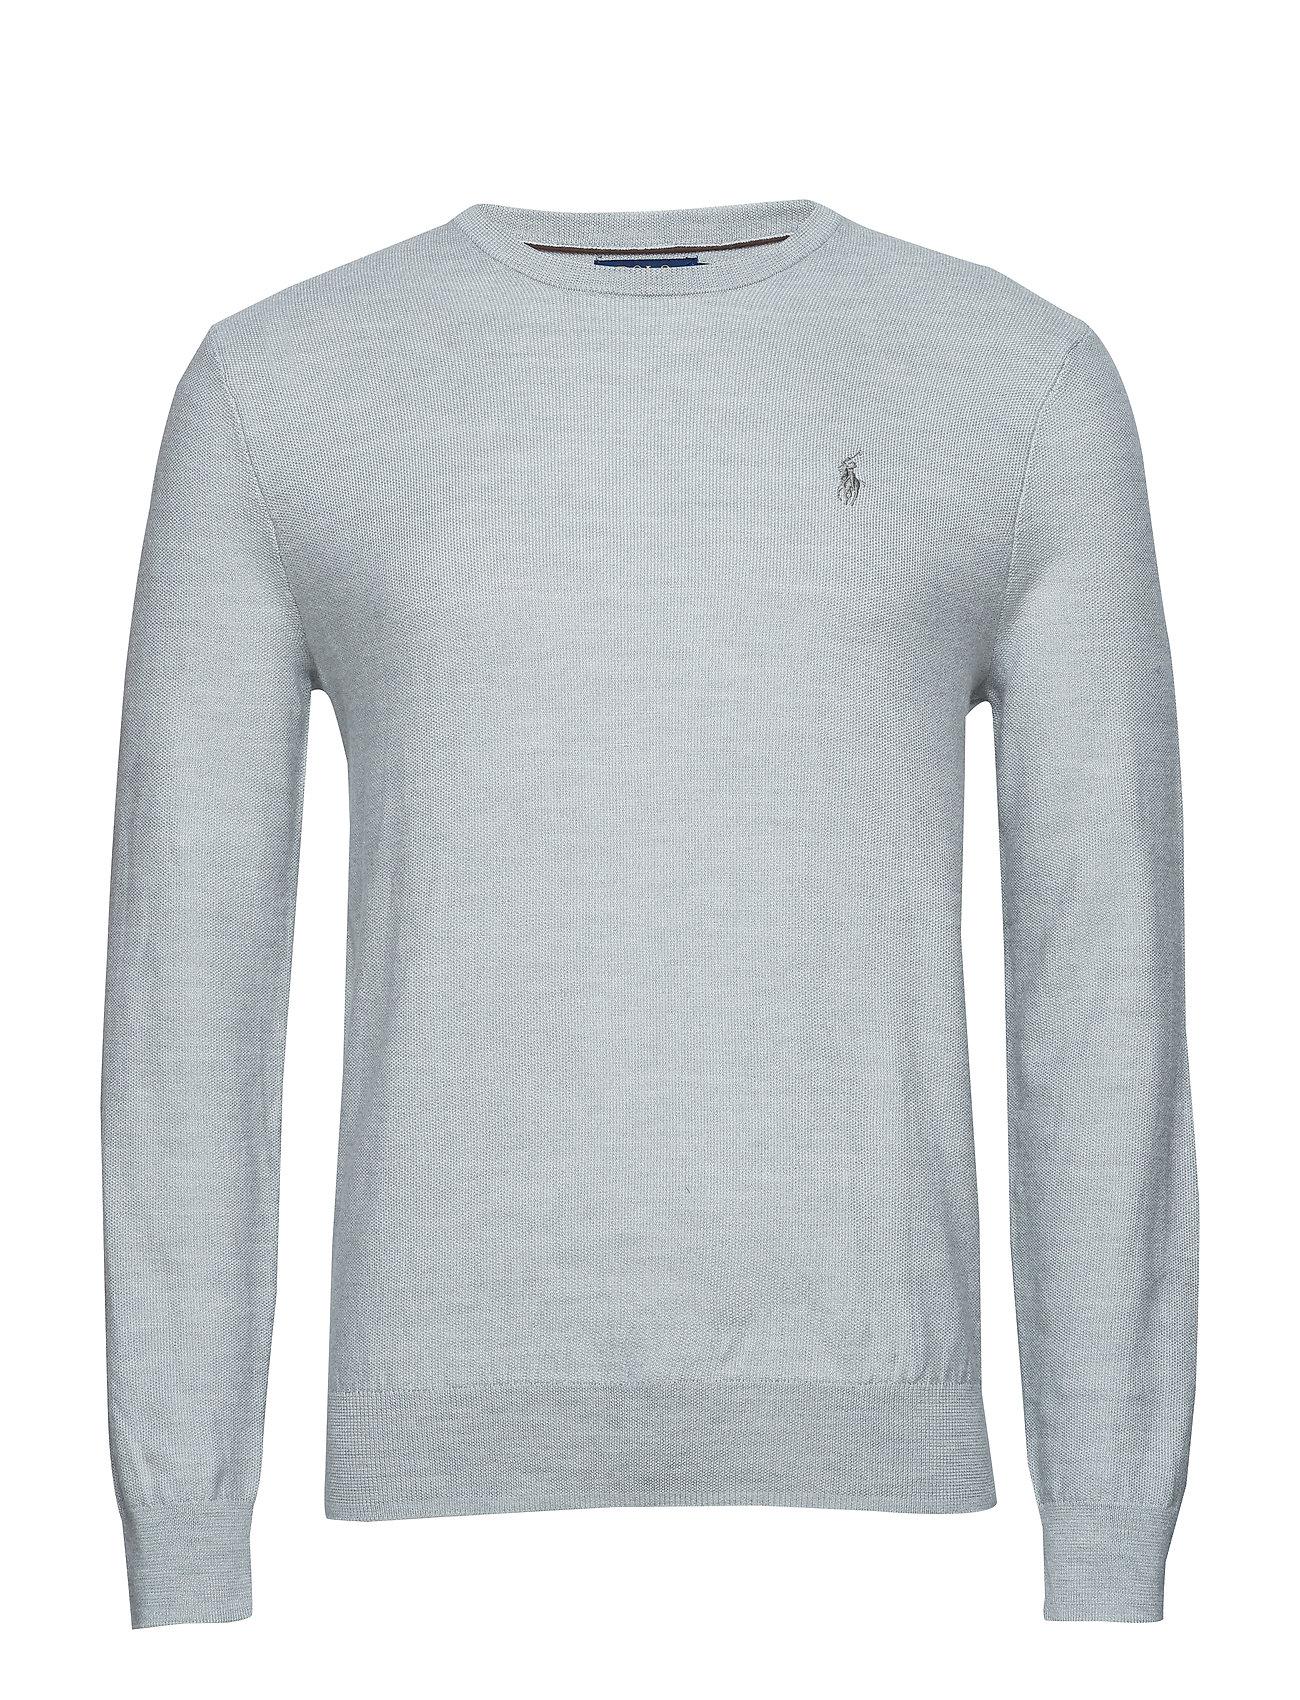 8b28066be Merino-silk-cashmere Sweater (Cool Grey Heather) (£129) - Polo Ralph ...